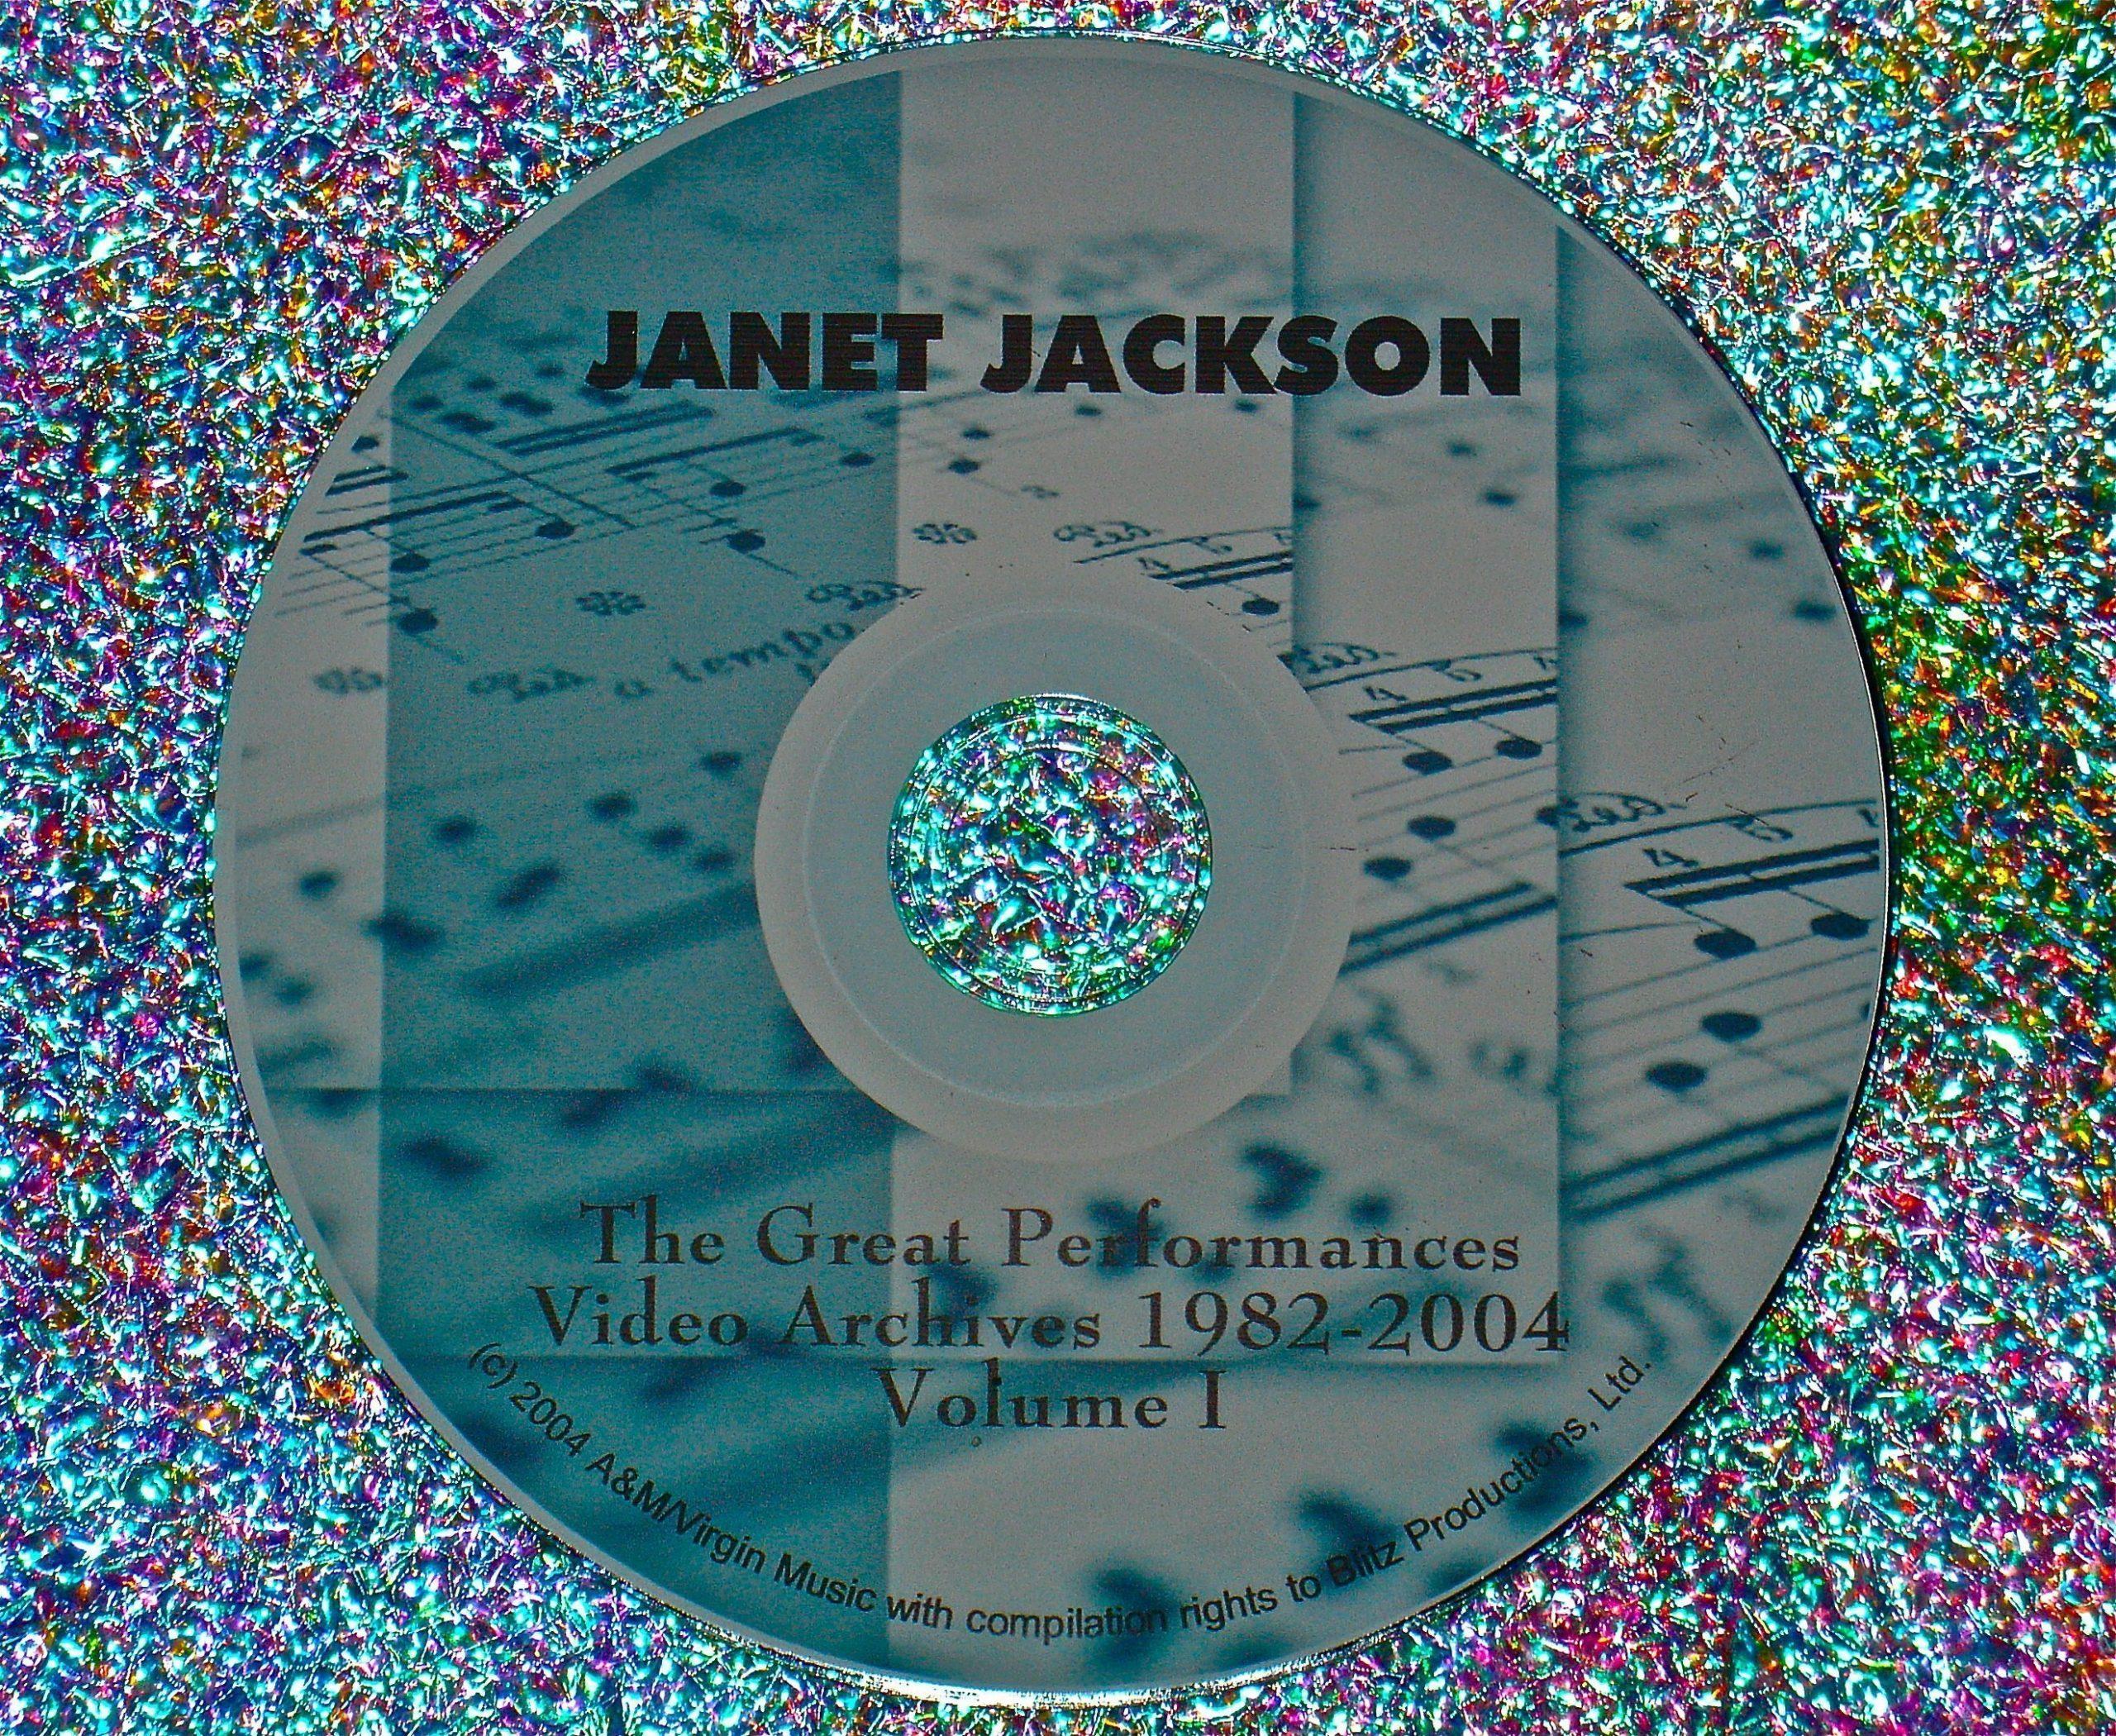 Janet Jackson Greatest Performances Archives 1982-2004 Volume I (2 Hrs.)